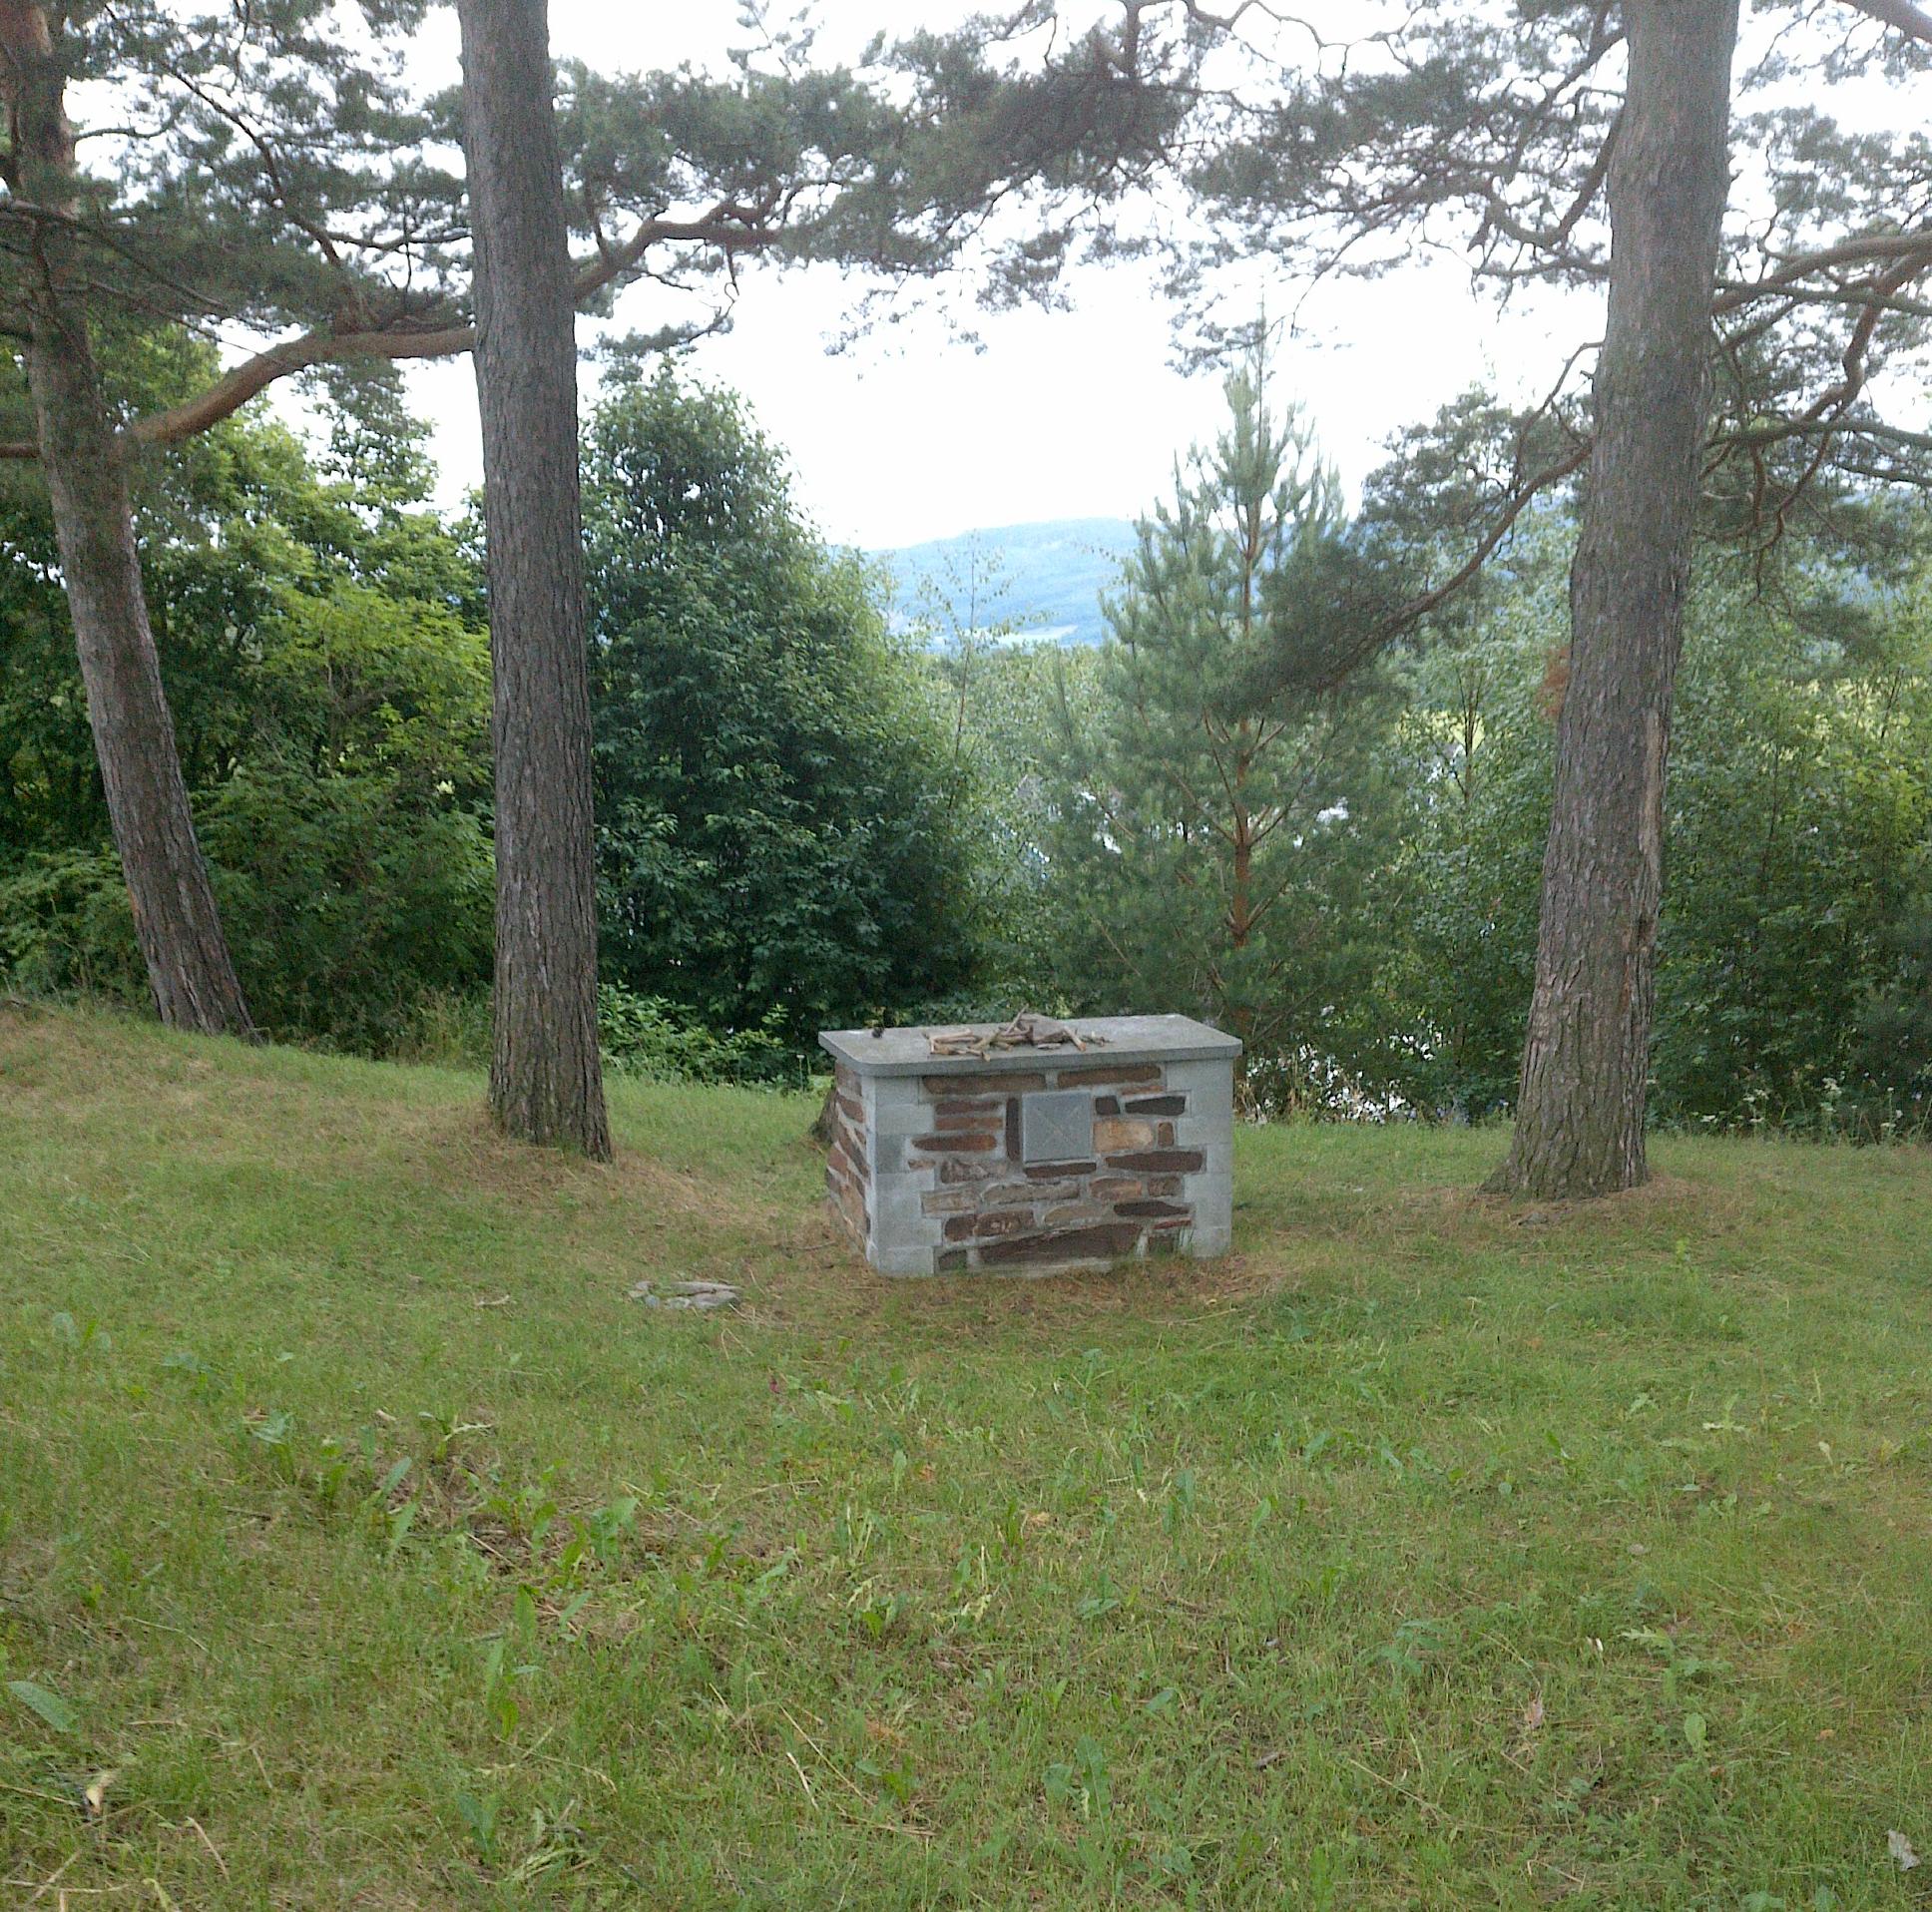 Man antar at alteret i Haug kirka sto her.